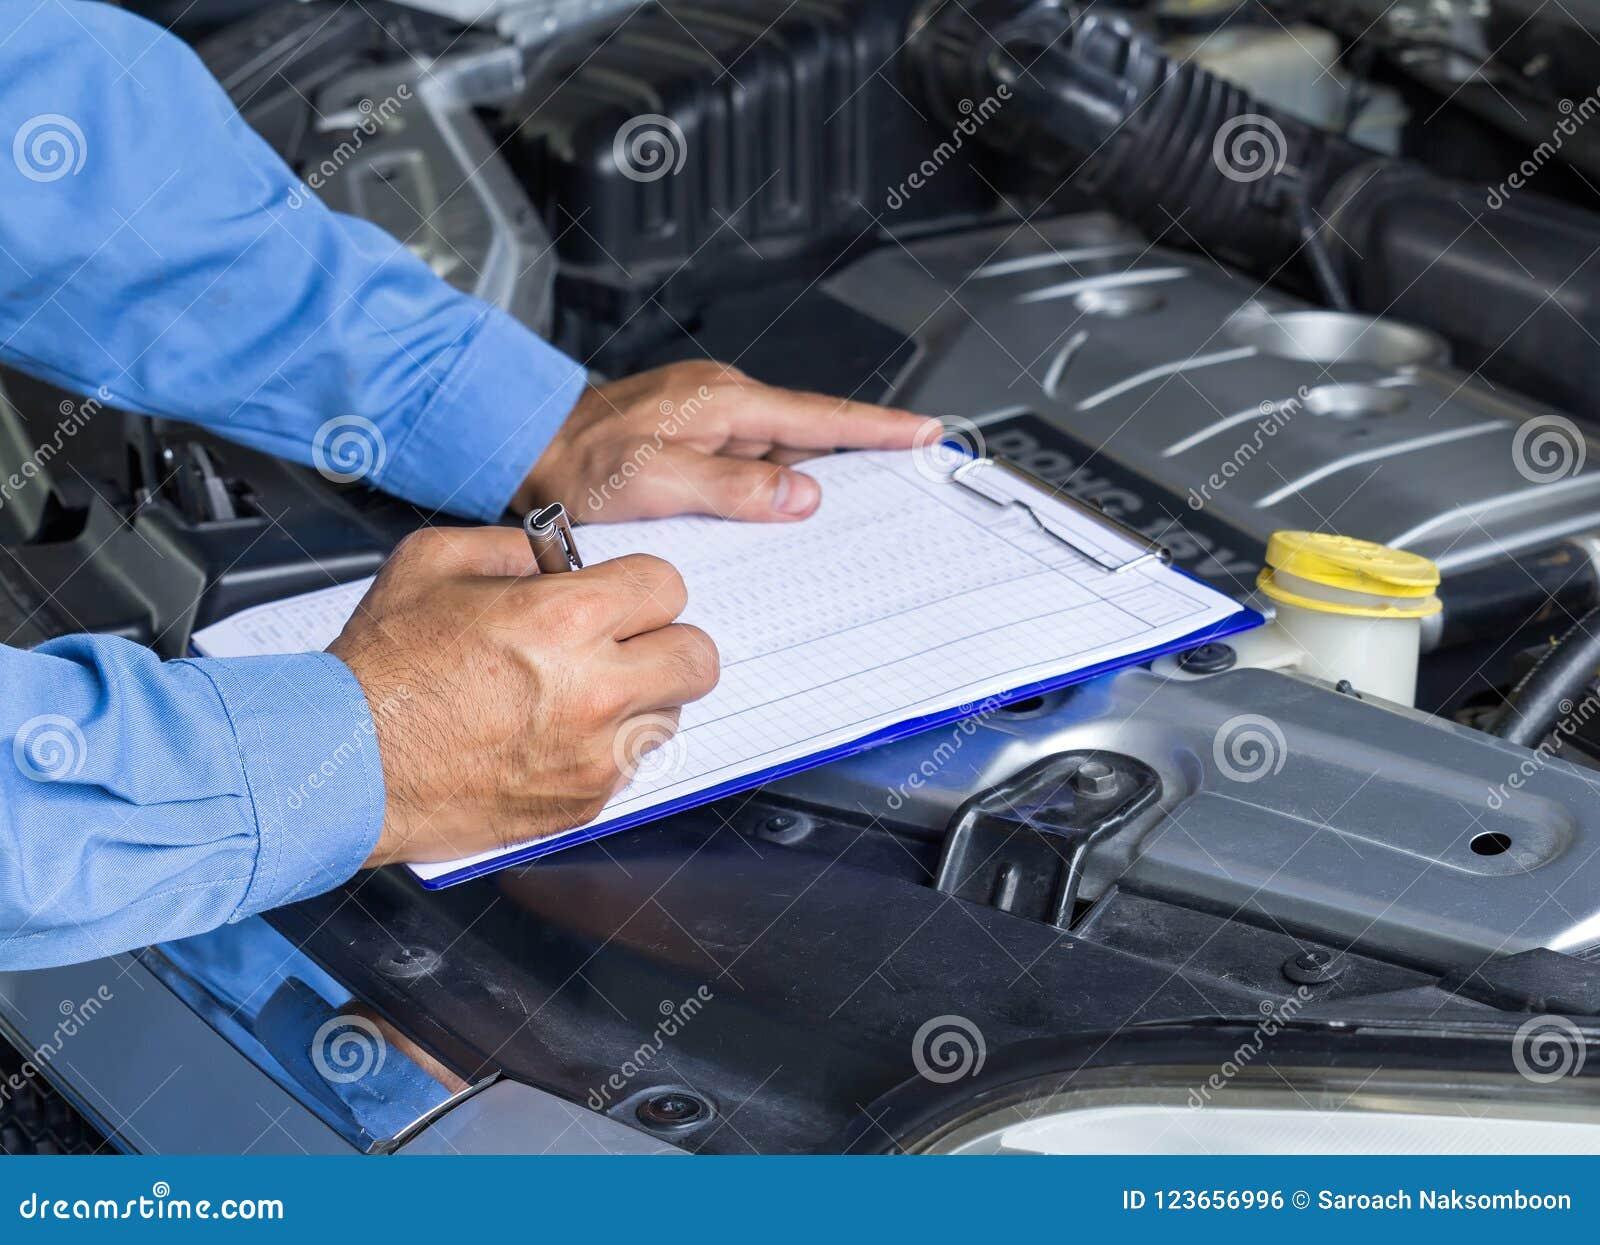 Car repair service, Auto mechanic checking car engine